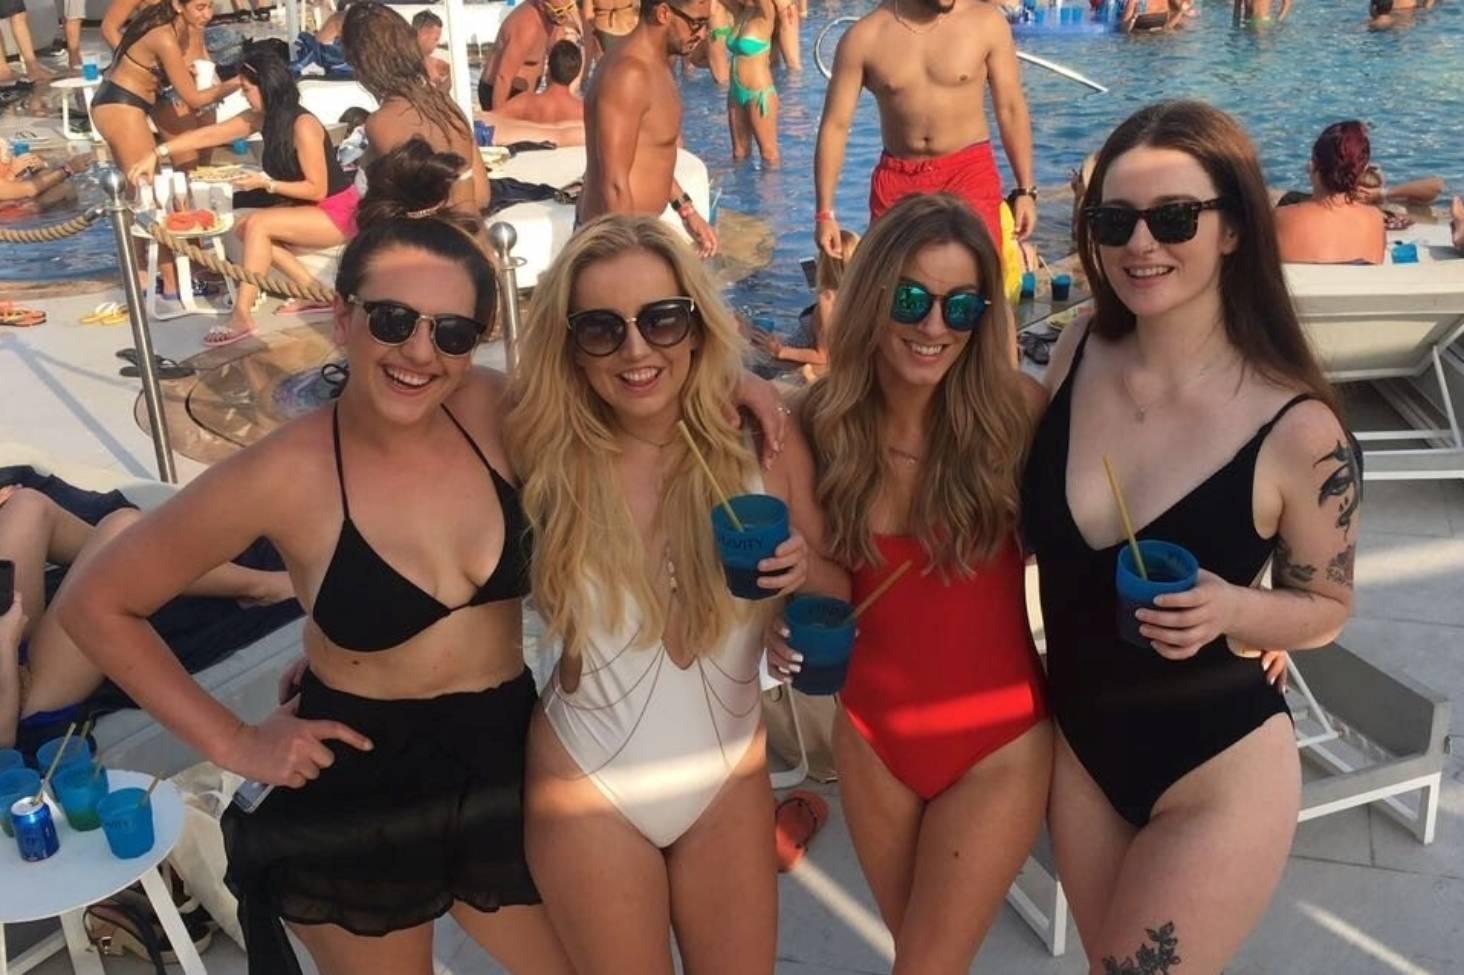 Bikini Stacey Ridell nude photos 2019